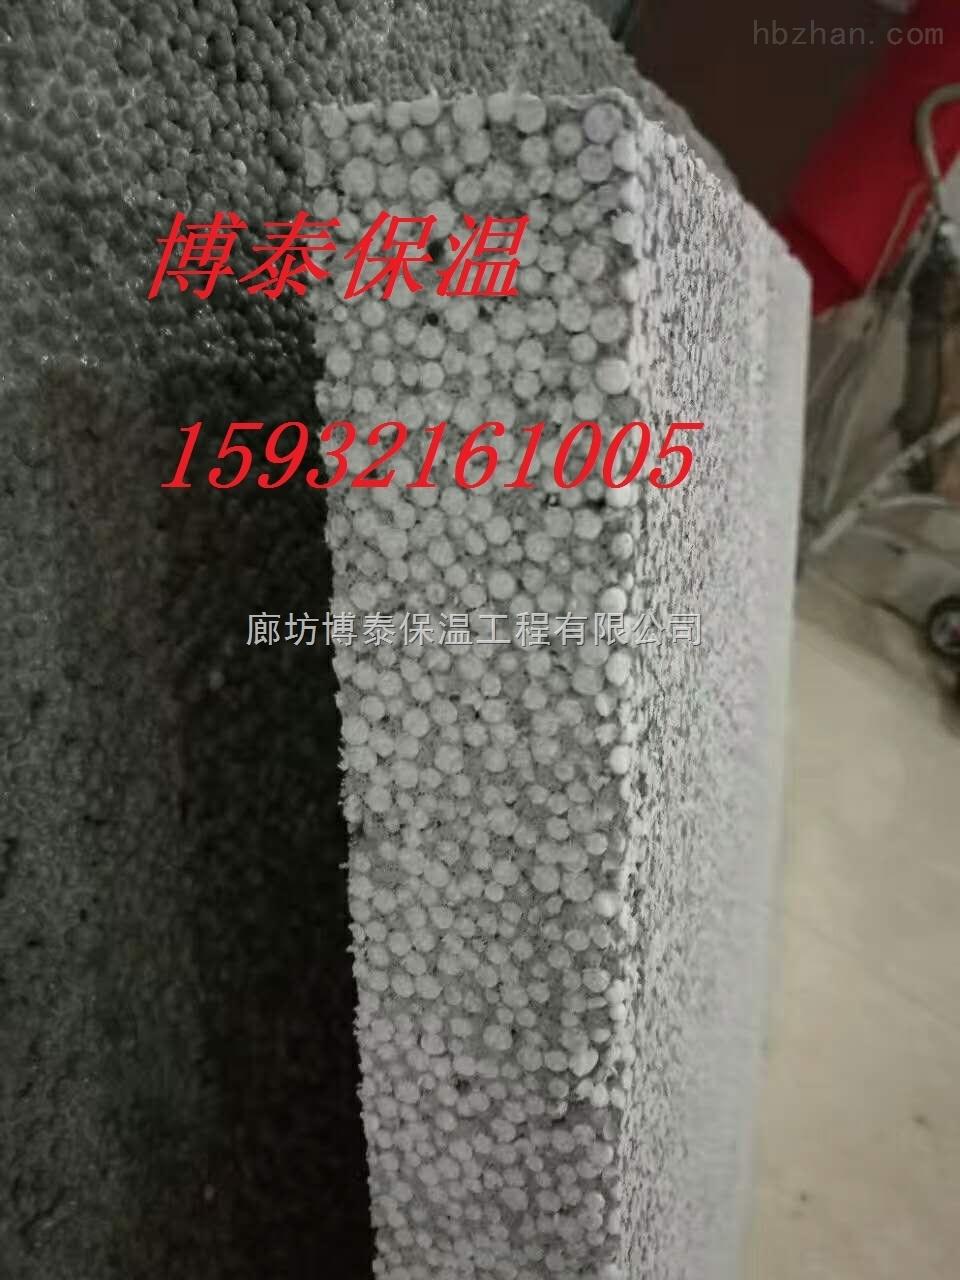 600x600-廊坊博泰A级防火水泥增强聚苯板